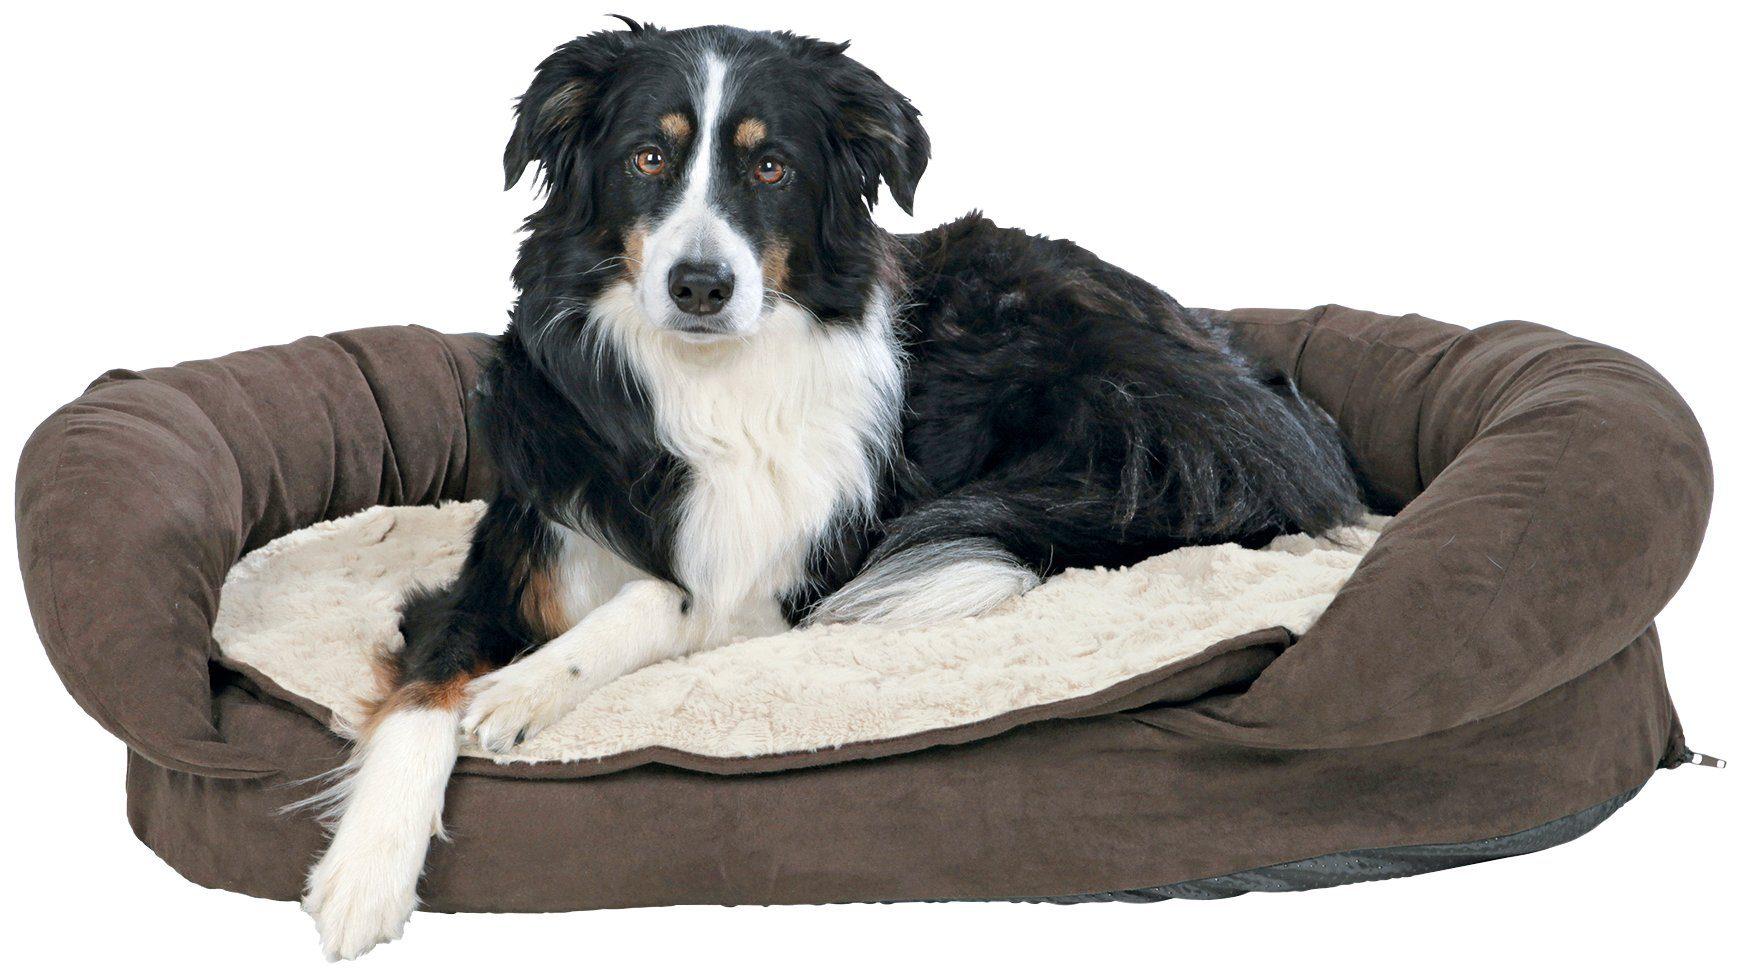 Hunde-Bett »Vital Bett Fabiano«, BxL: 120x75 cm, braun/beige